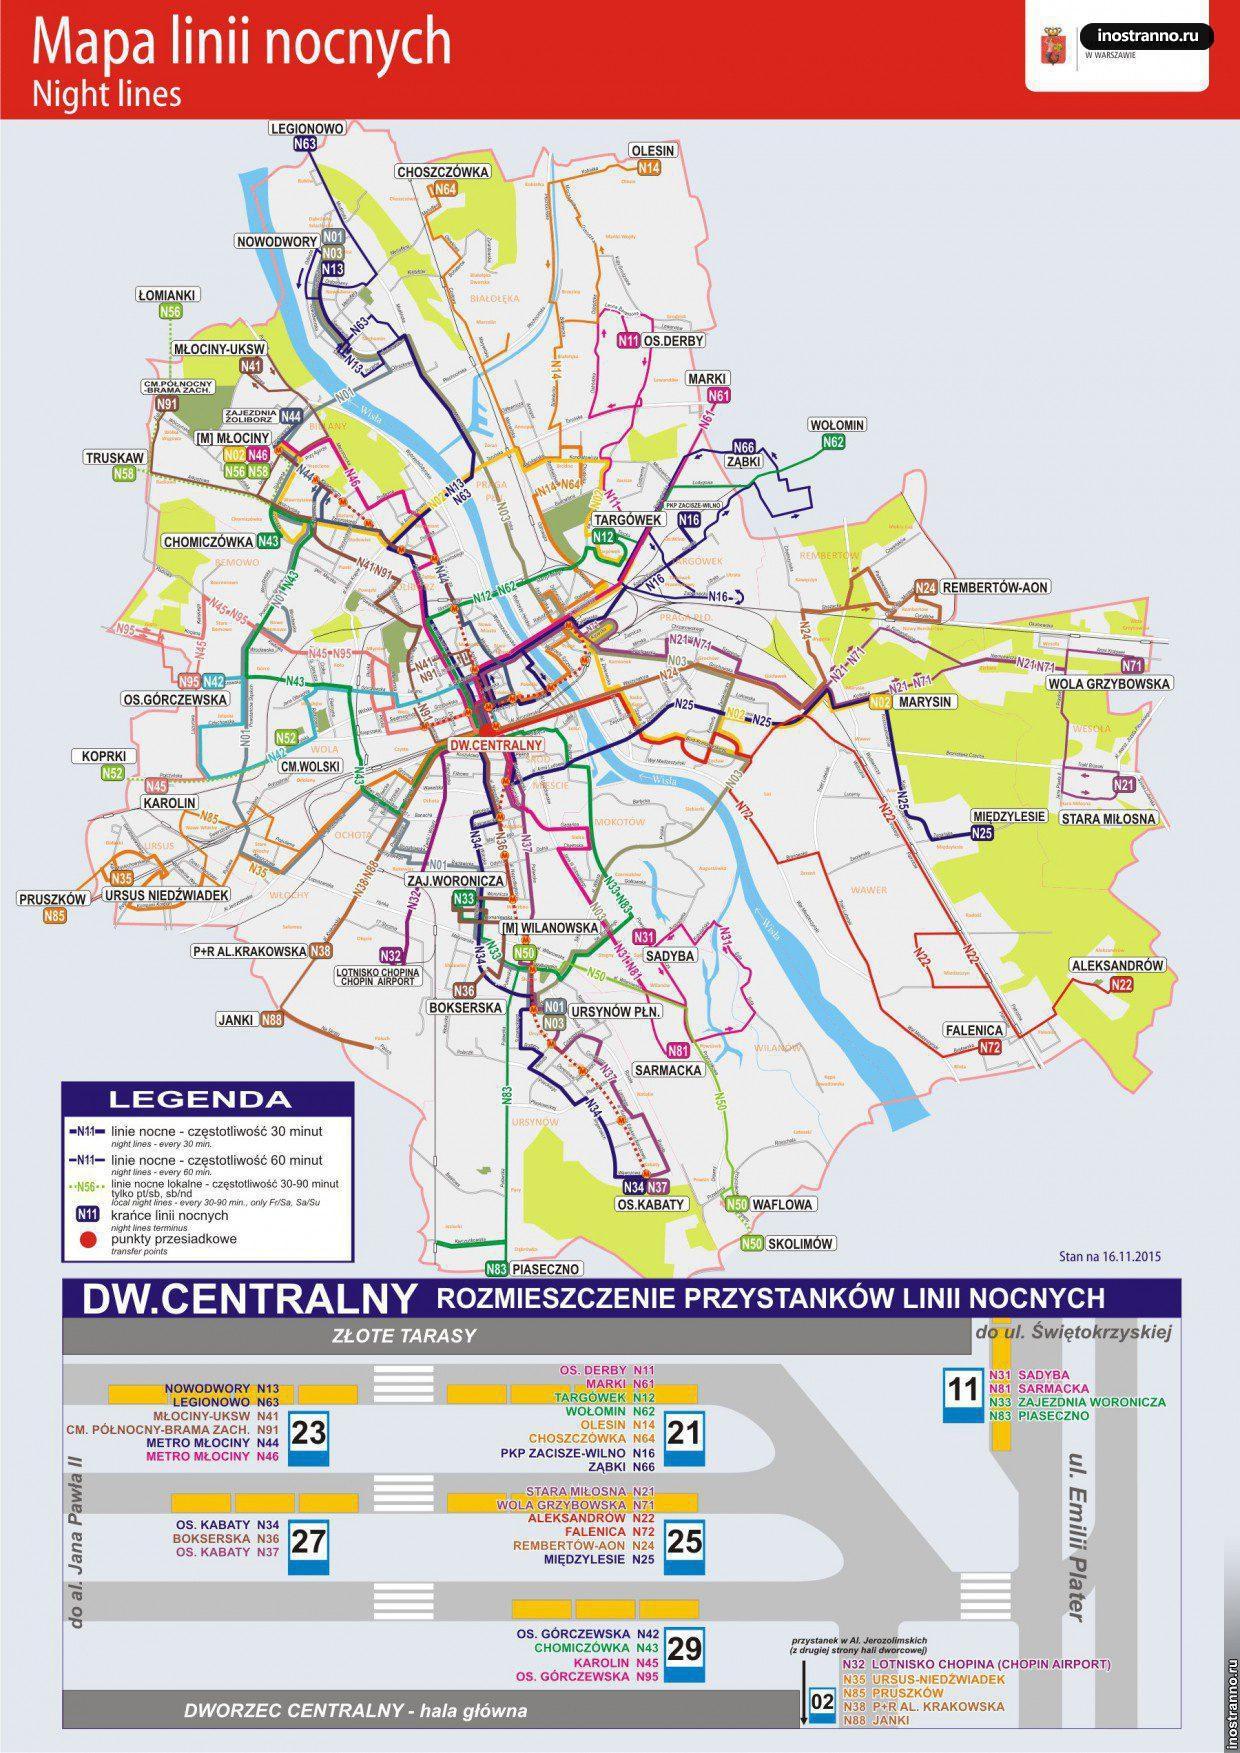 Маршруты ночных автобусов в Варшаве